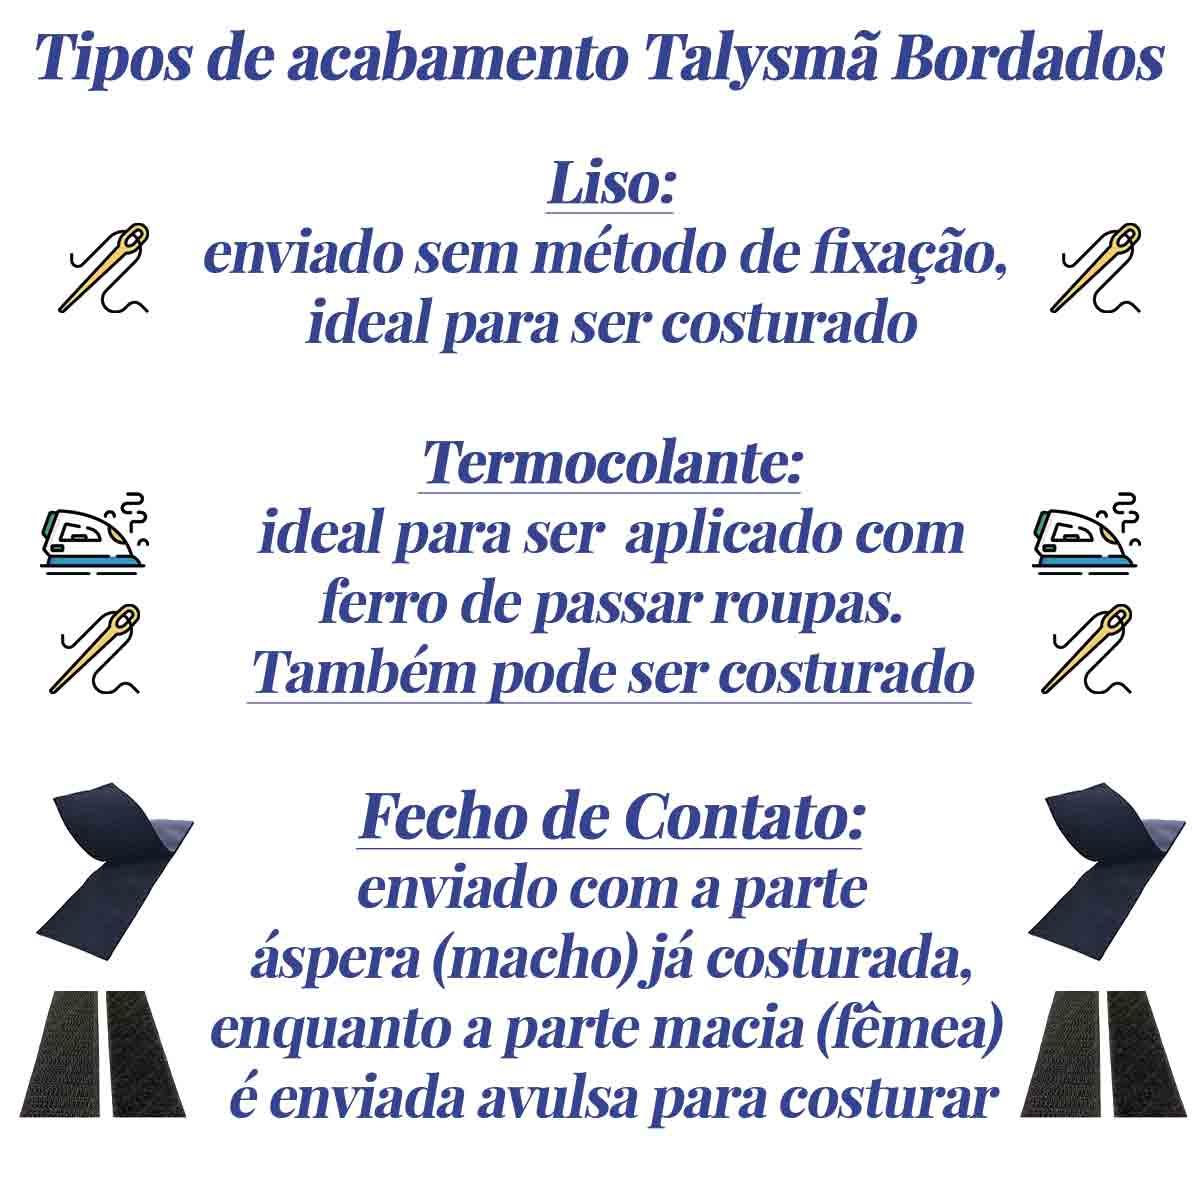 Patch Bordado - Alfabeto Letra T DV80533-419  - Talysmã Bordados